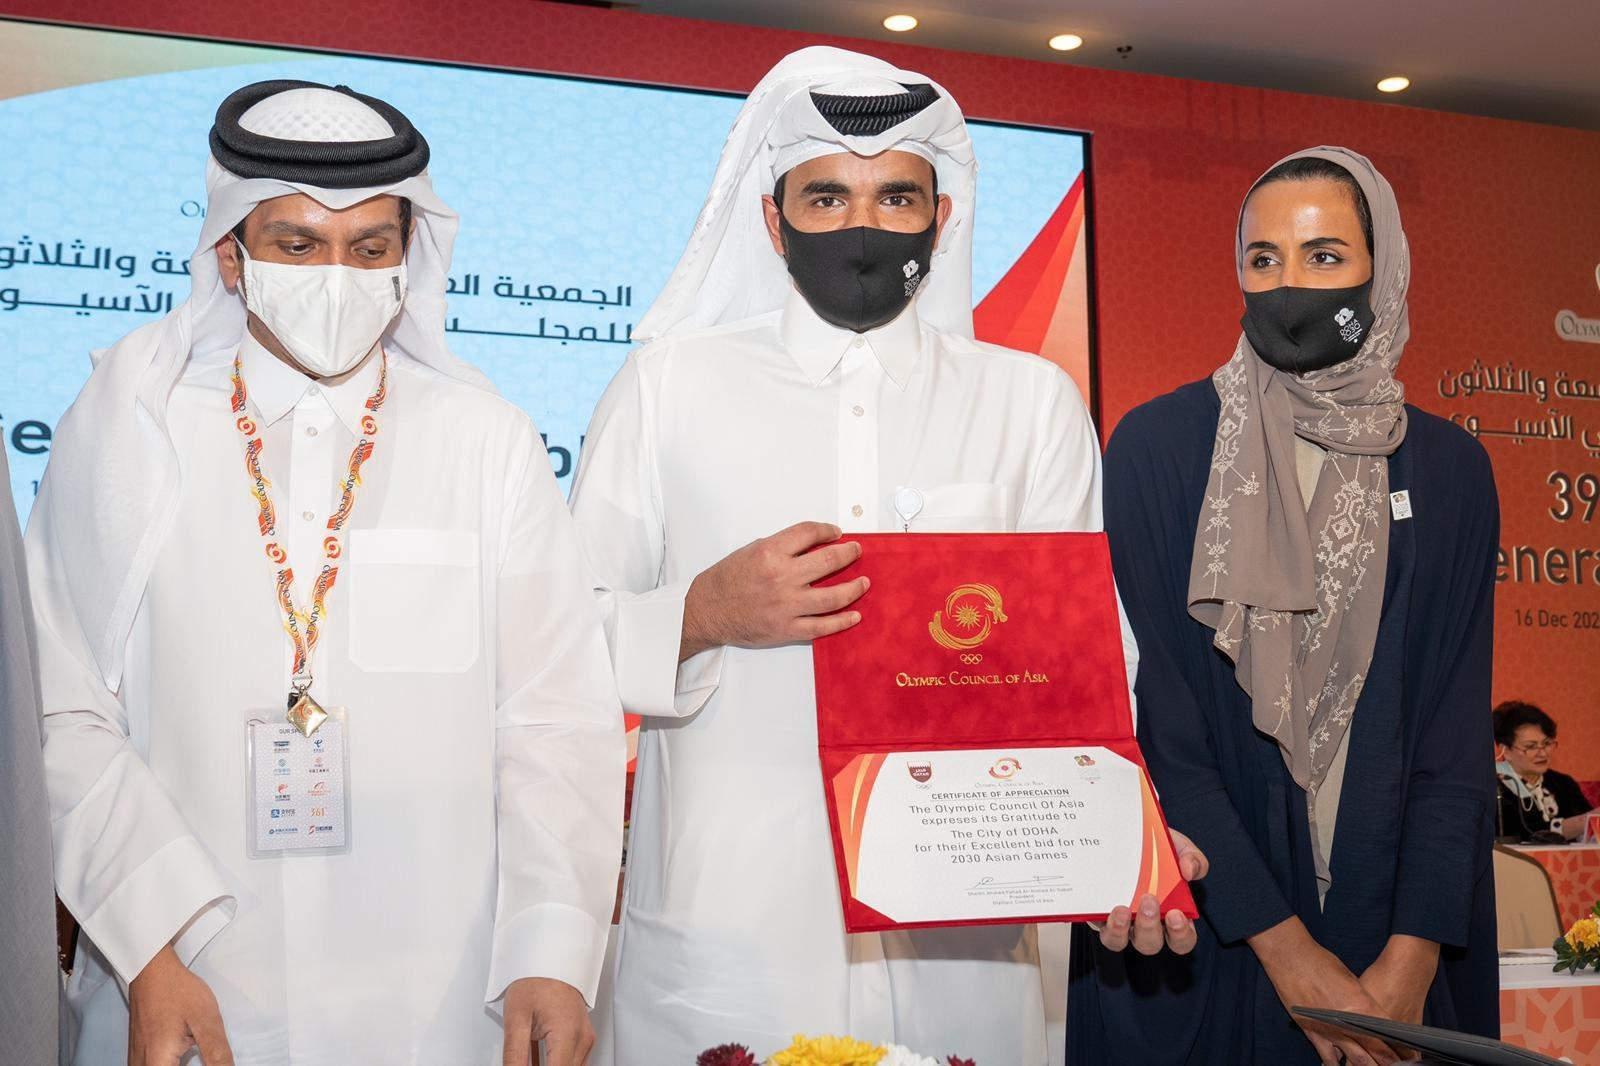 Qatar Wins Bid to Host 2030 Asian Games: Detailed Report